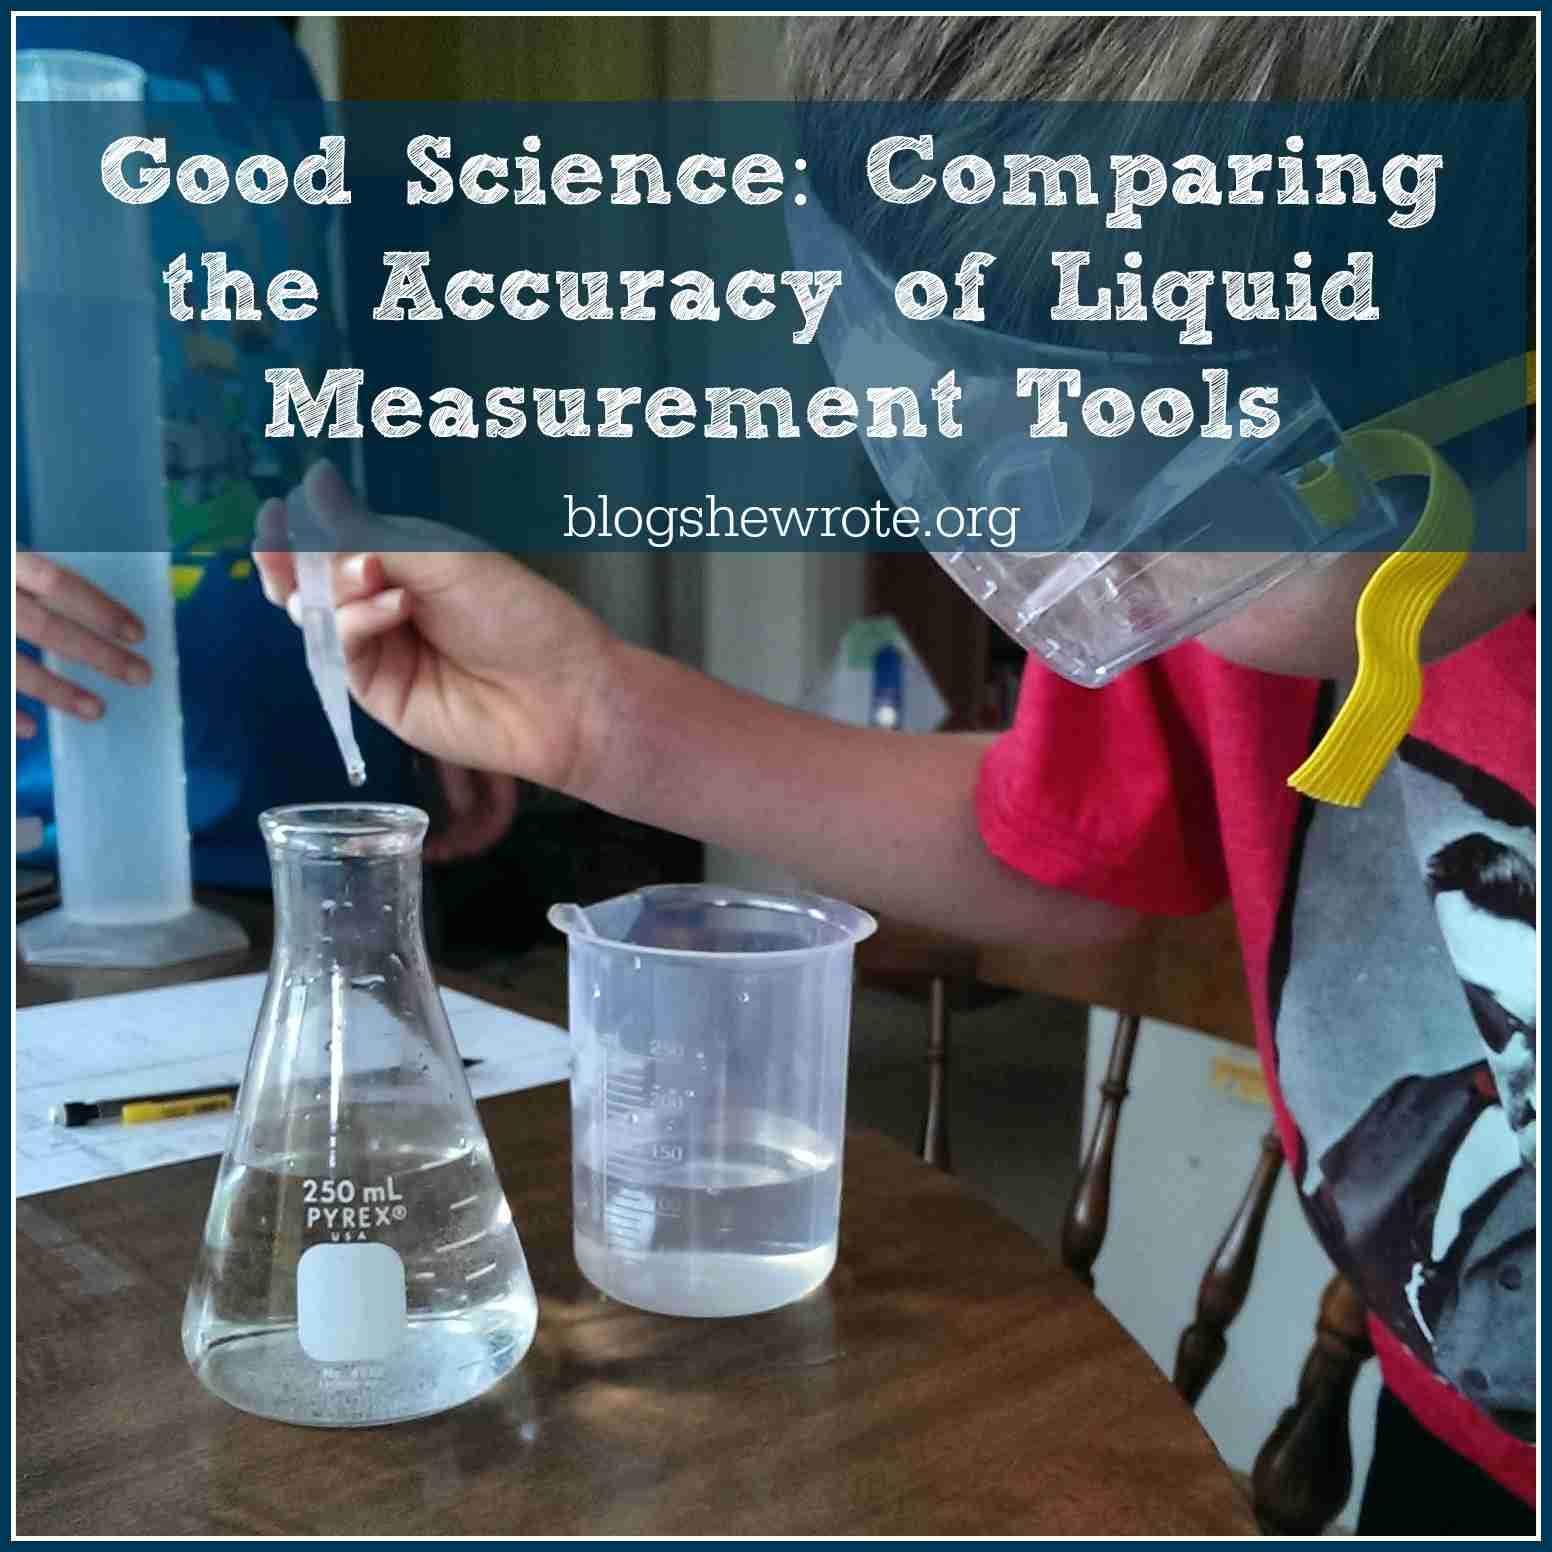 Comparing The Accuracy Of Liquid Measurement Tools